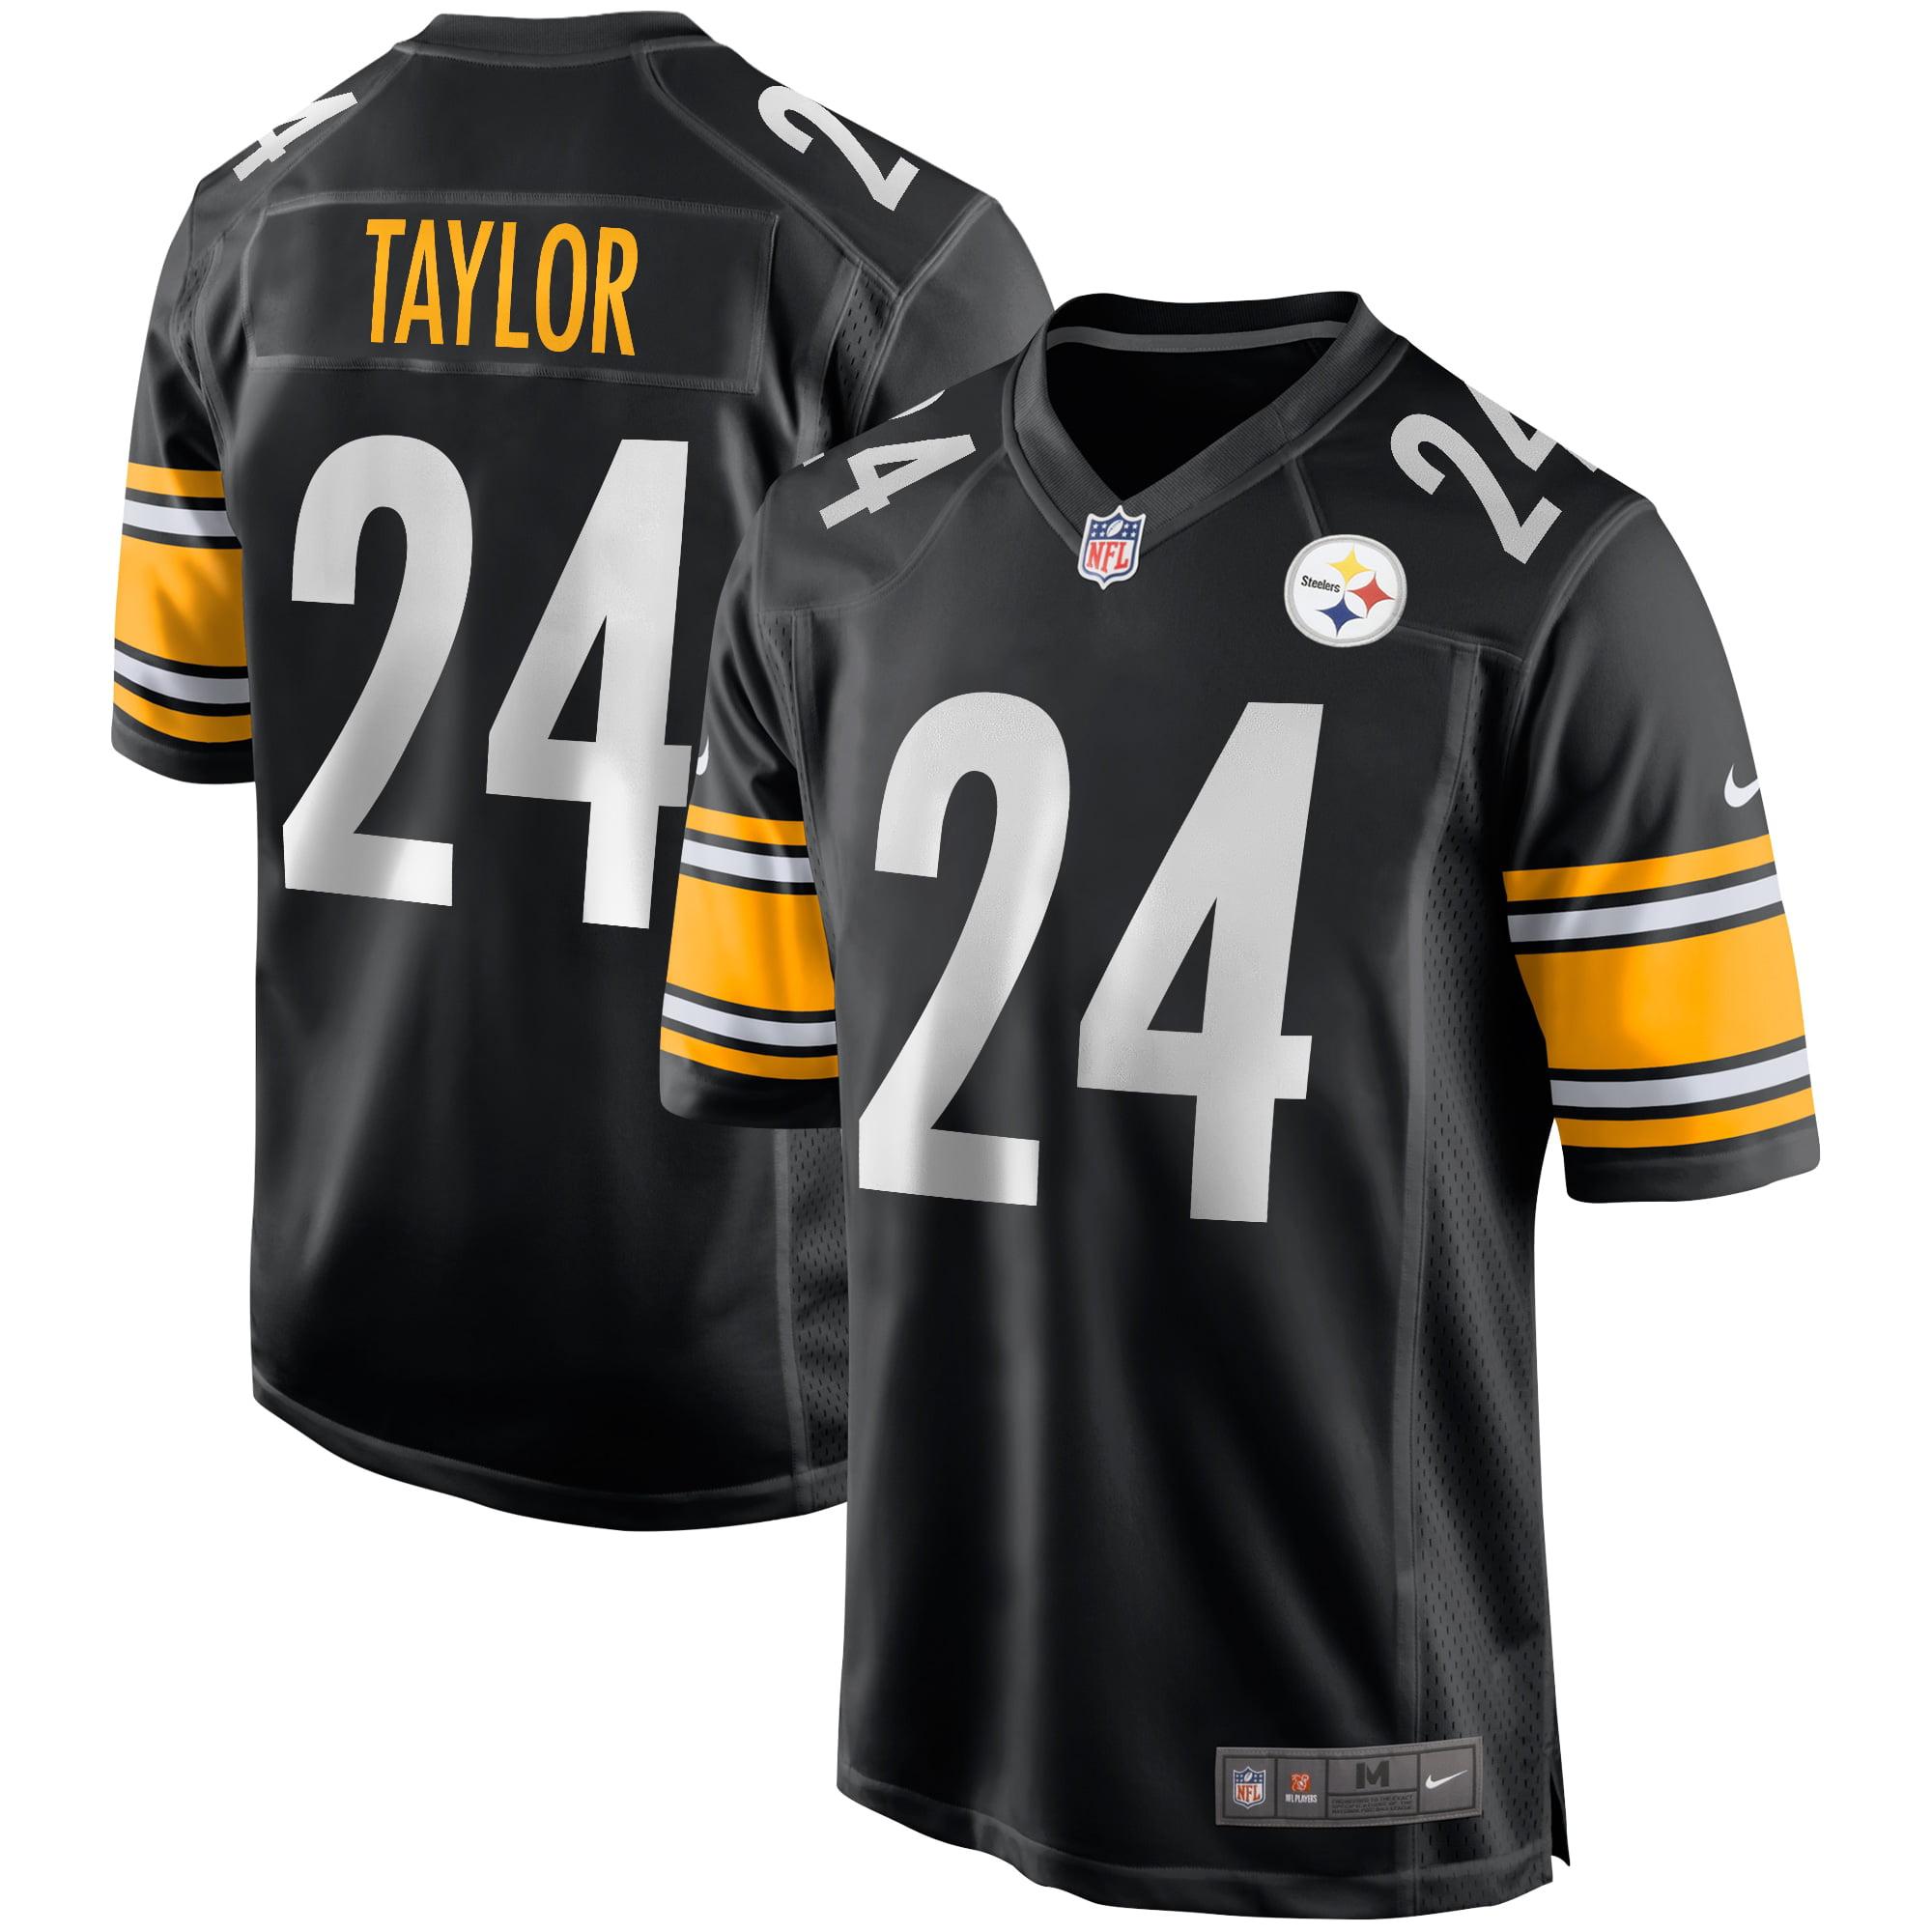 Ike Taylor Pittsburgh Steelers Nike Game Retired Player Jersey - Black - Walmart.com